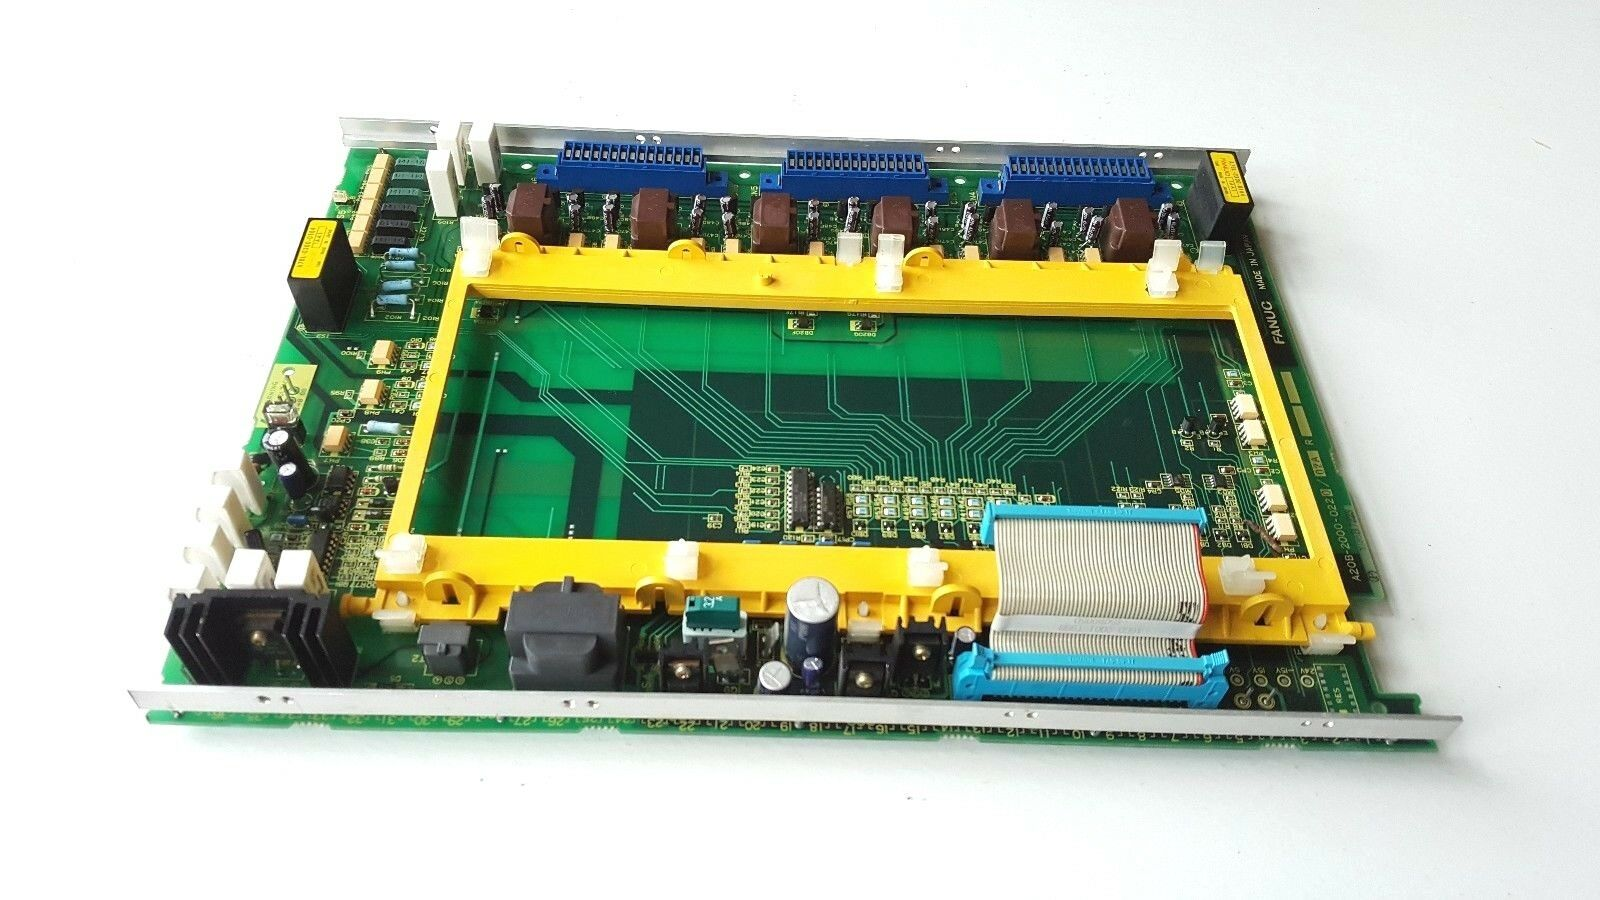 Fanuc A20b 2000 0220 02a Servo Pcp Board Pzo Ebay Prototype Pcb Printed Circuit Breadboard Protoboard 1200 Points